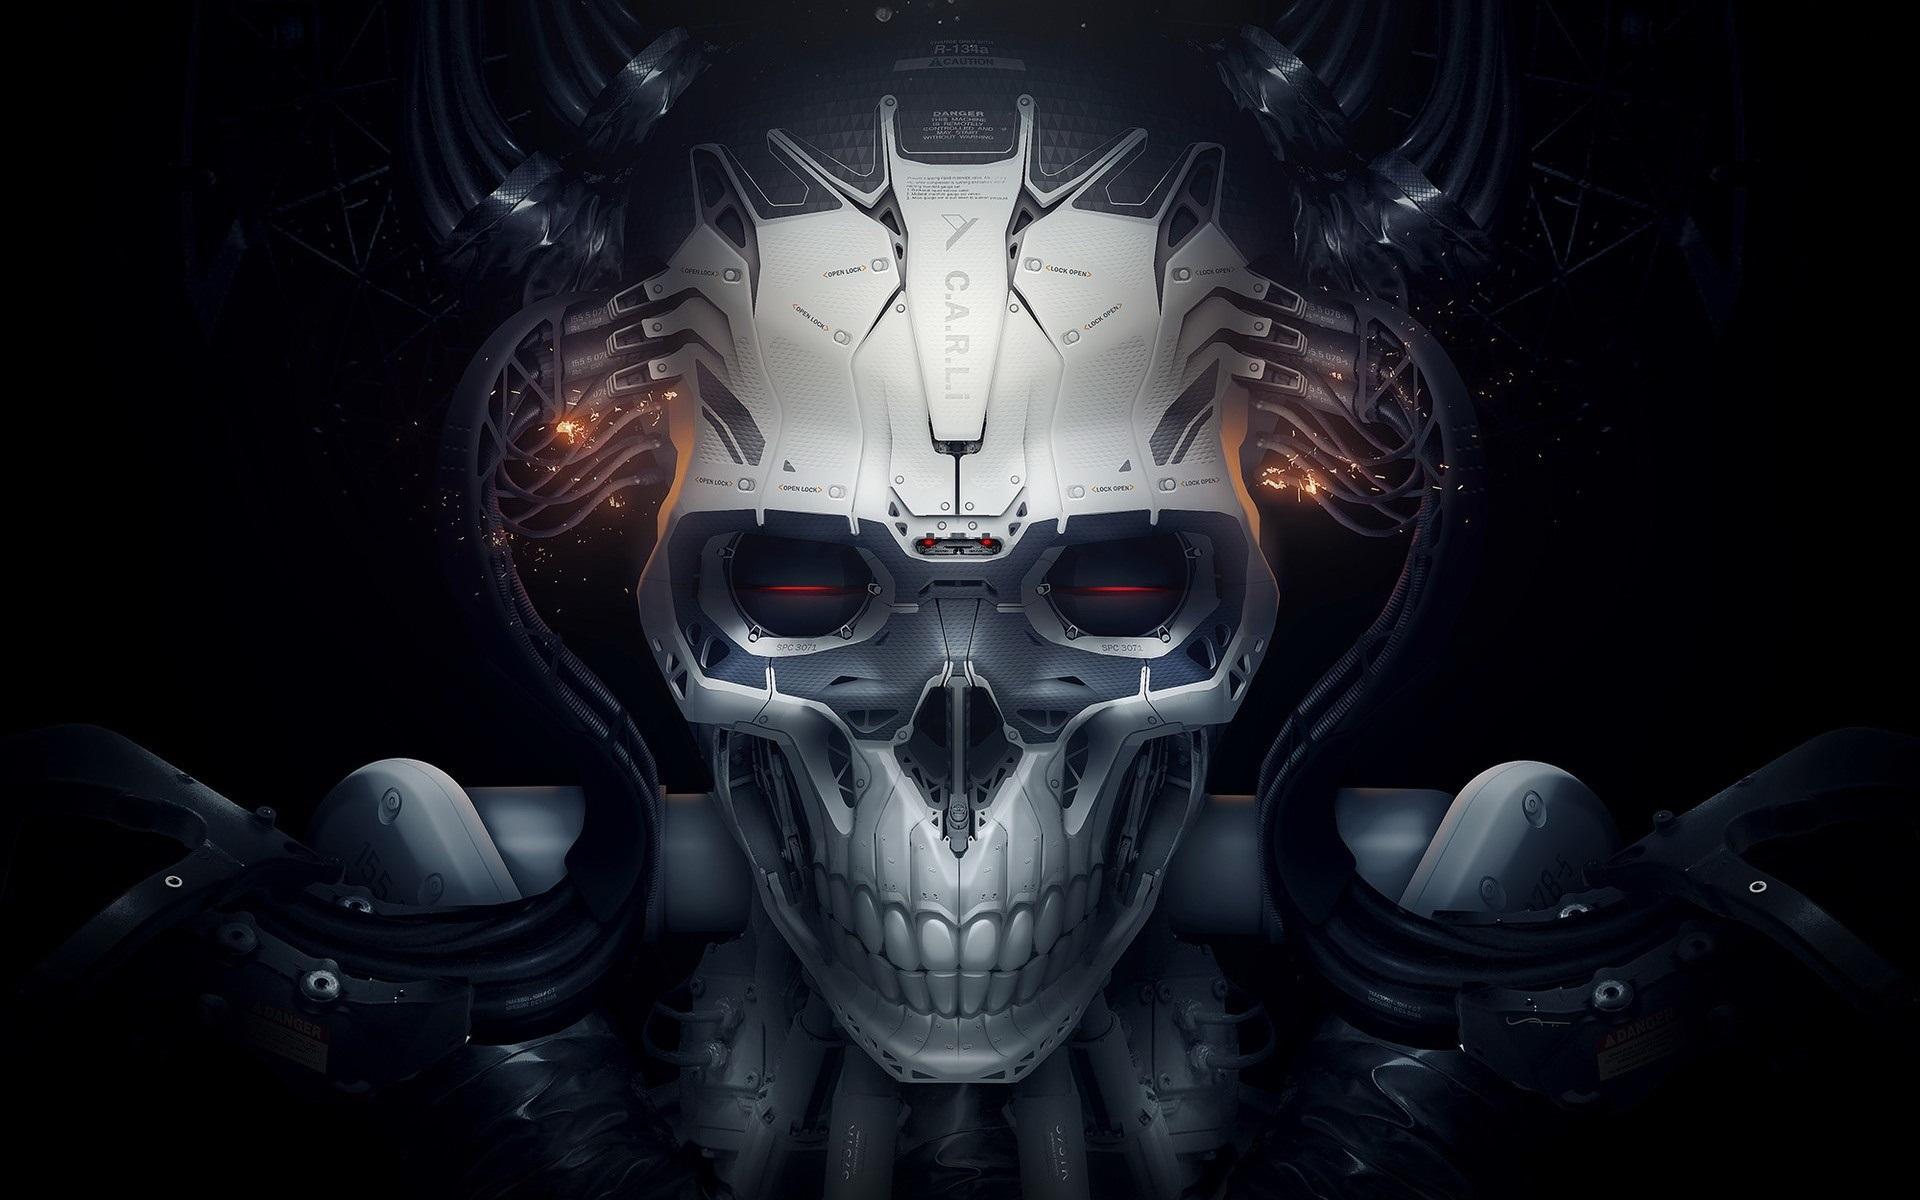 Wallpaper Skull Robot Creative Design 1920x1200 Hd Picture